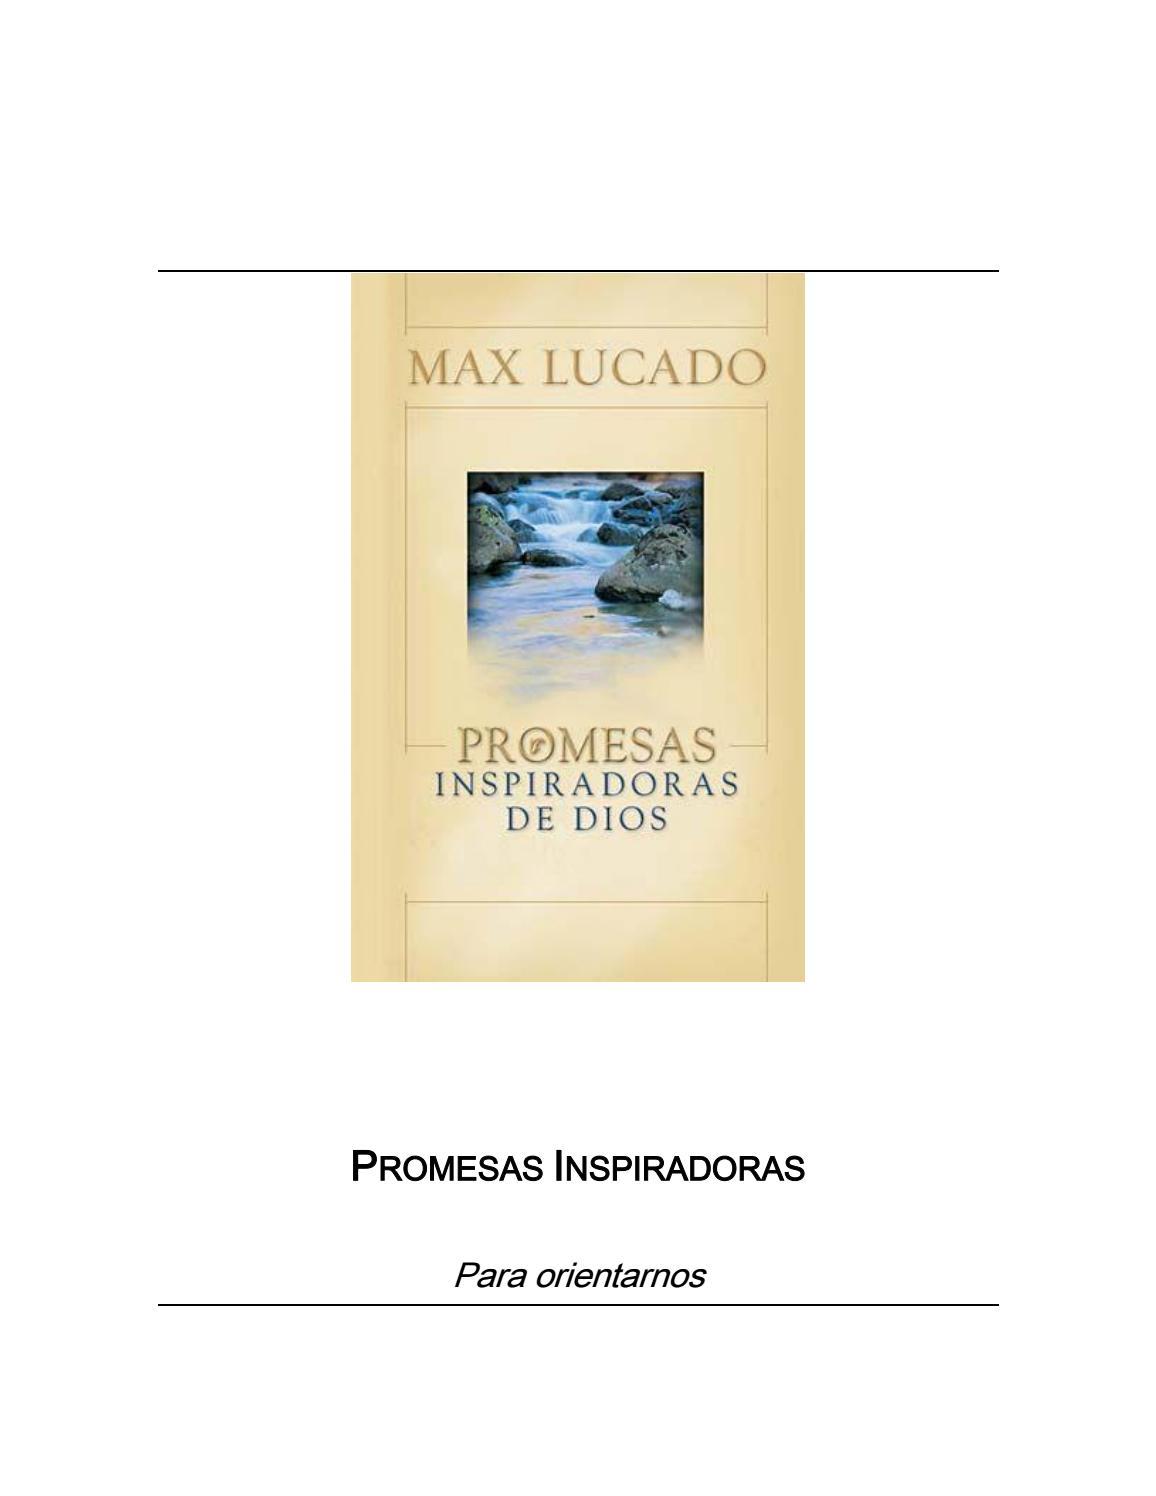 PROMESAS INSPIRADORAS DE DIOS